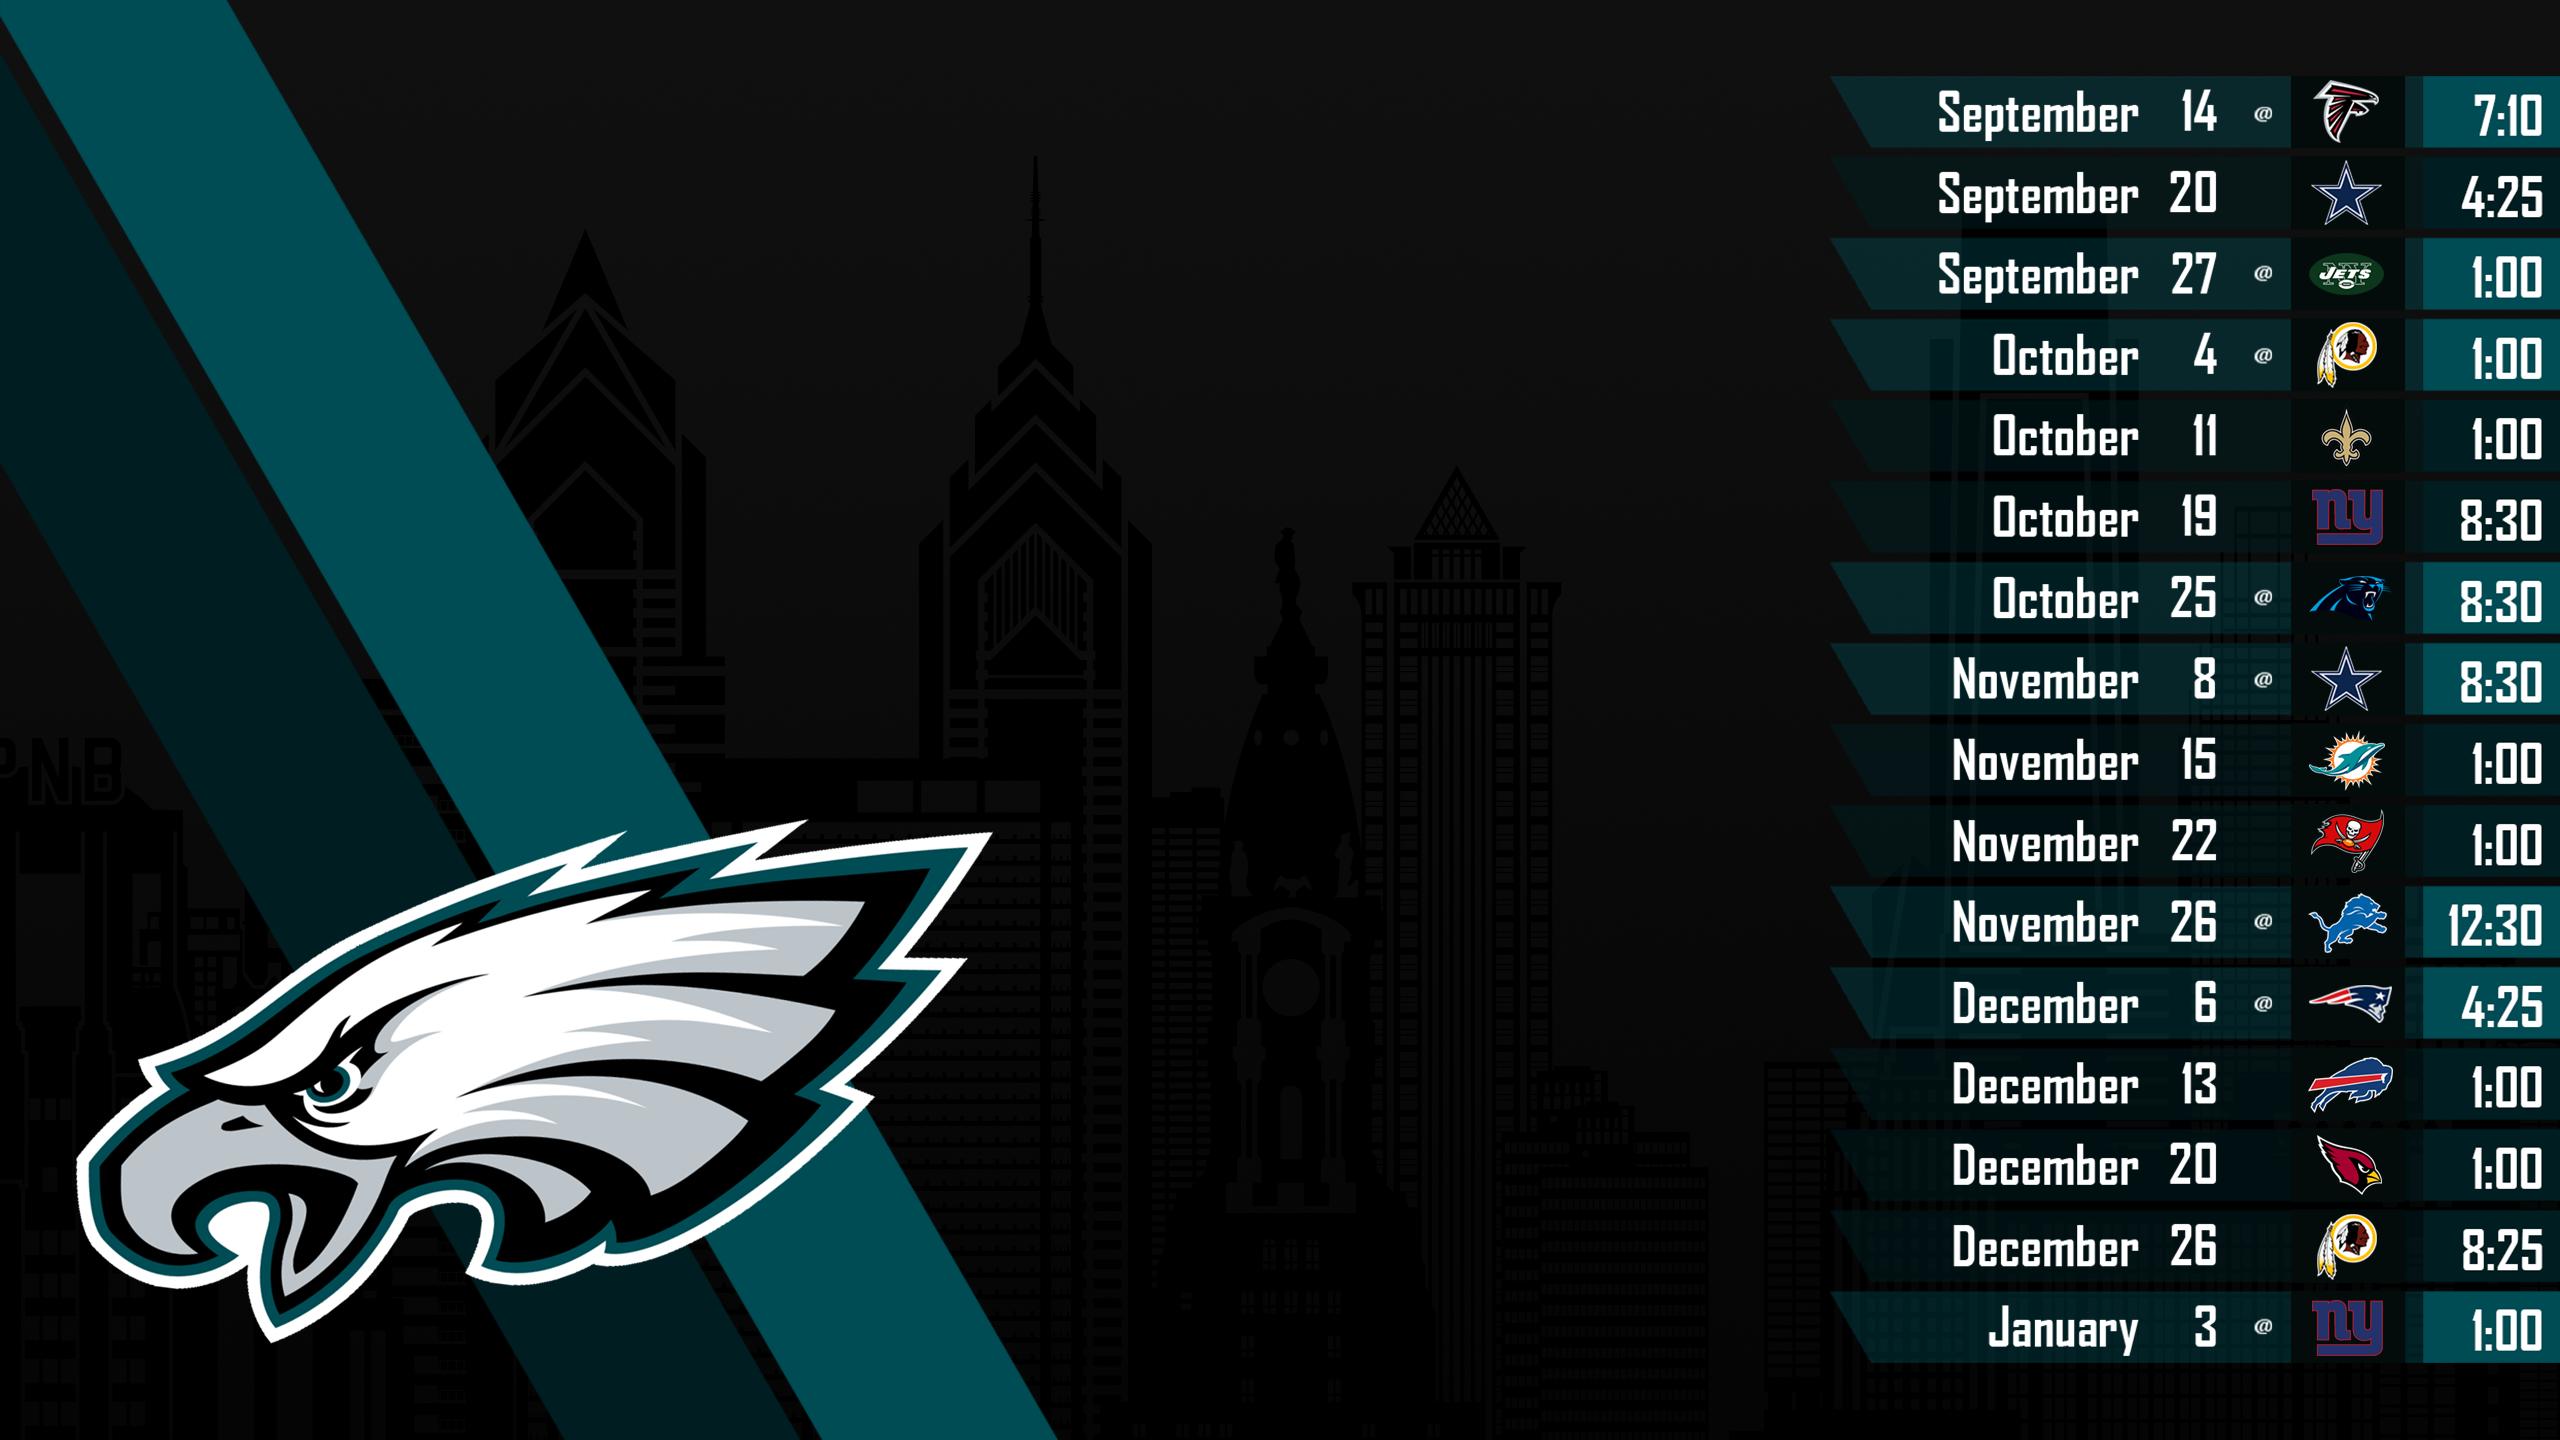 Desktop Wallpaper Philadelphia Eagles - Philadelphia Eagles Schedule Wallpaper 2018 , HD Wallpaper & Backgrounds